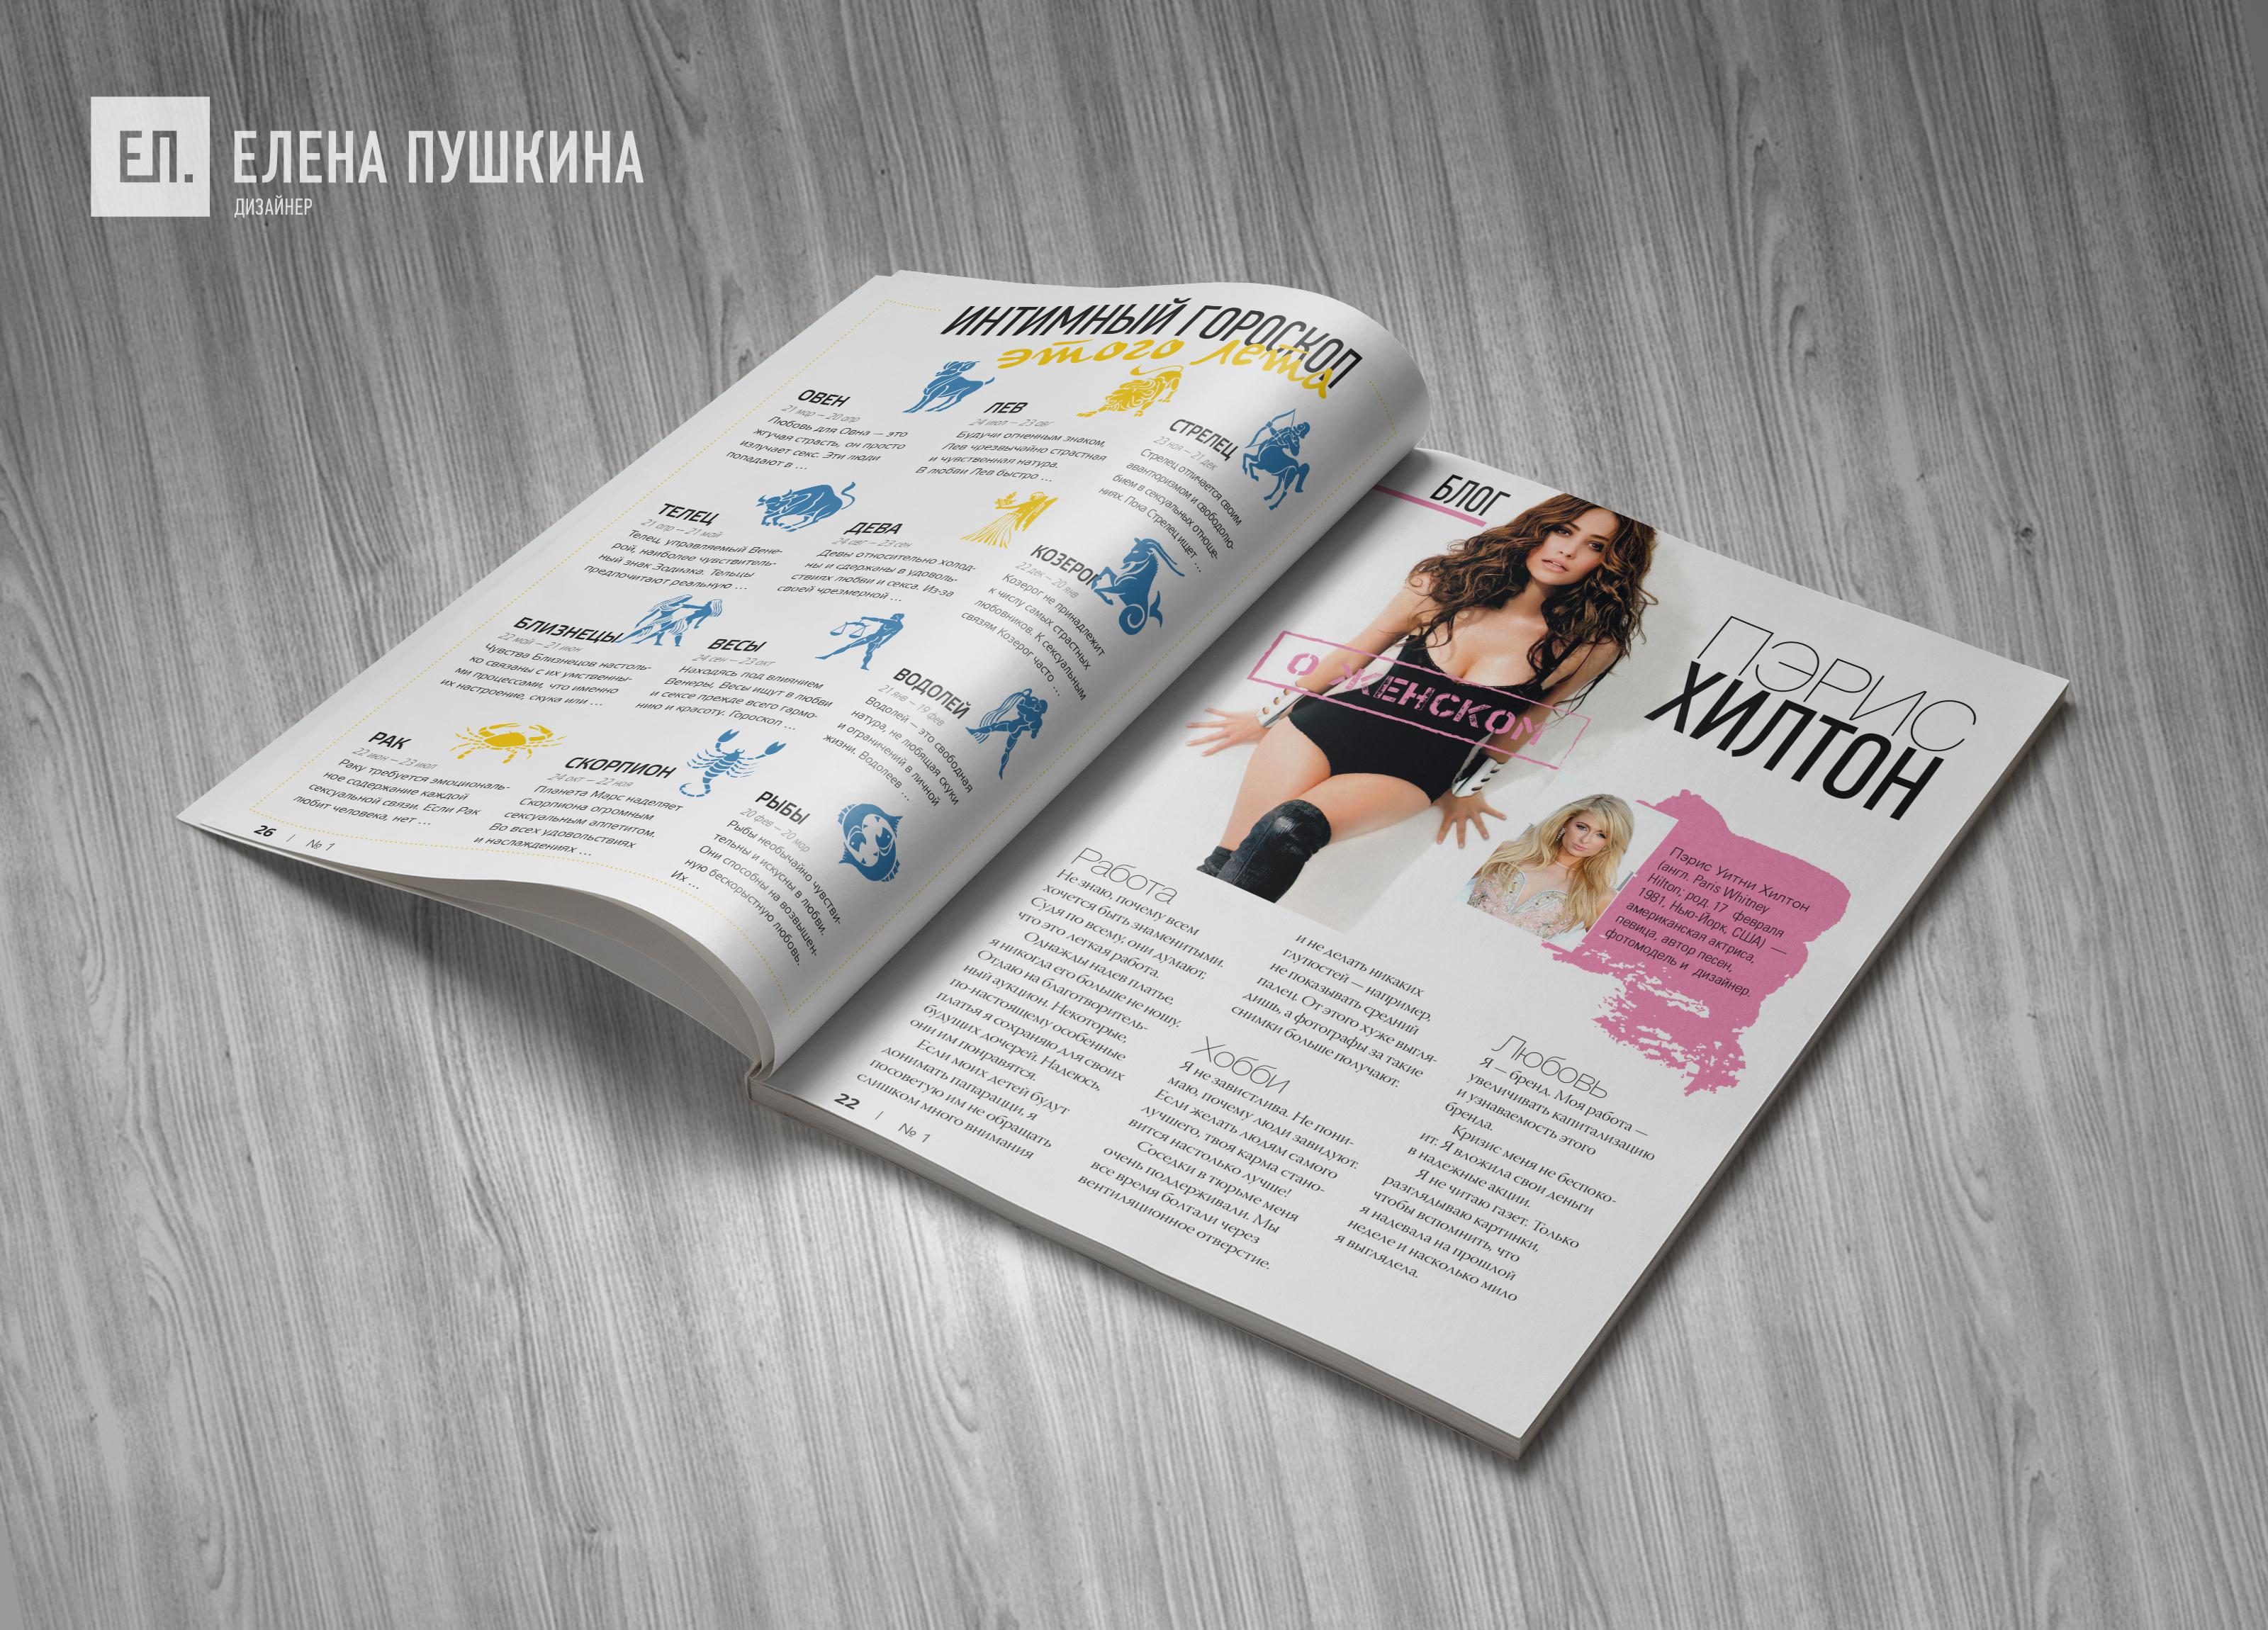 Глянцевый журнал «LoveStyle»— разработка с«нуля» логотипа, обложки имакета журнала Разработка журналов Портфолио